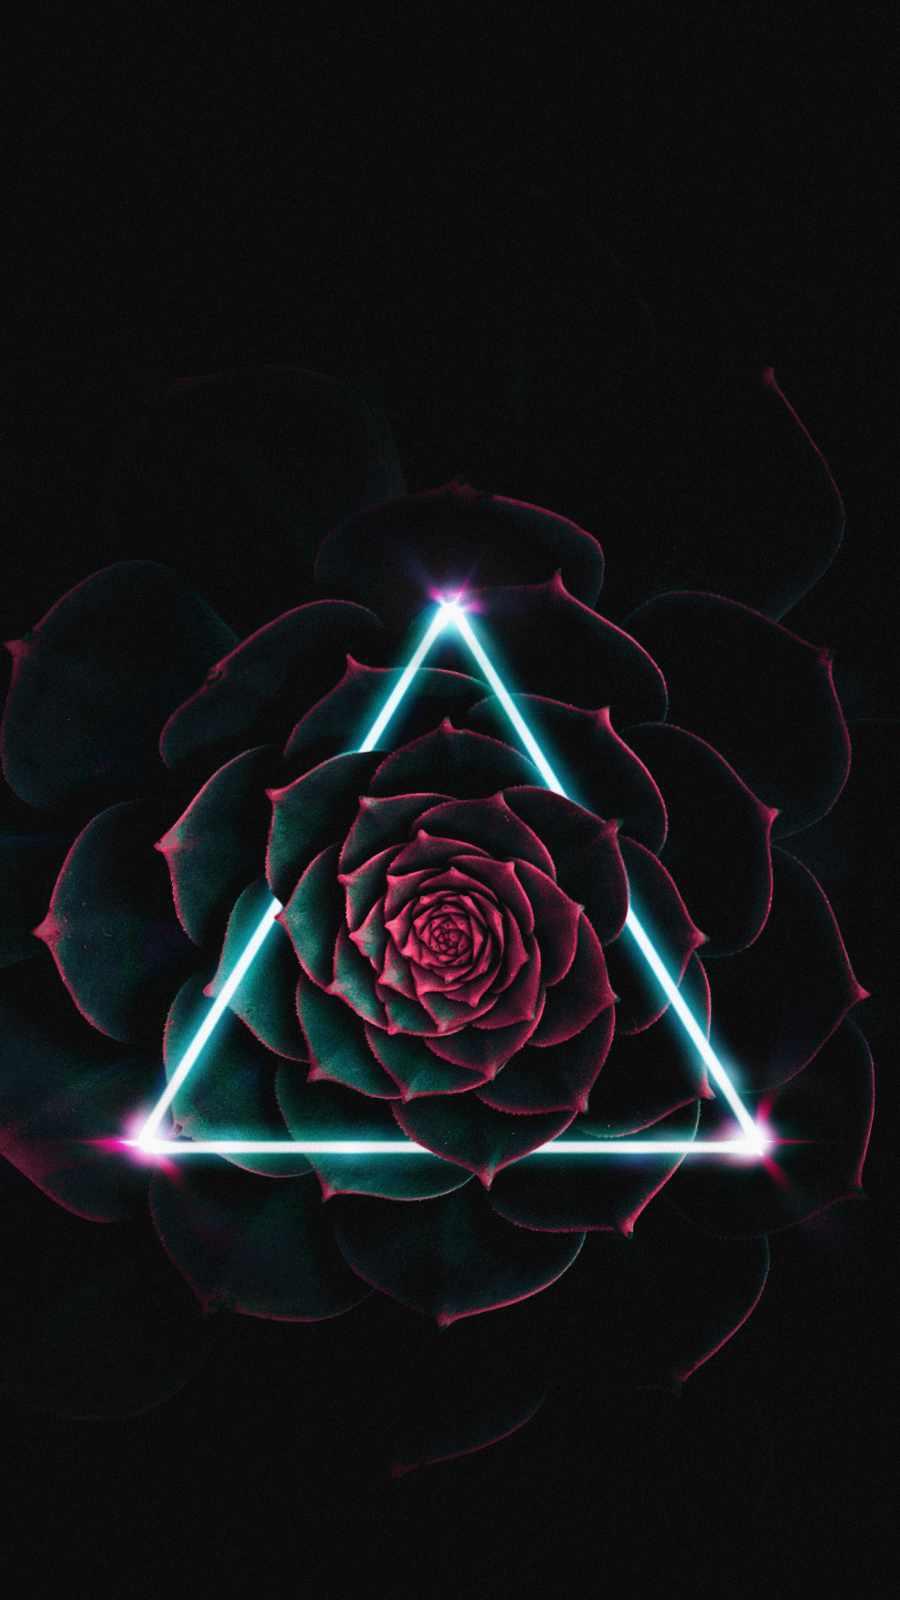 Neon Triangle Flower iPhone Wallpaper